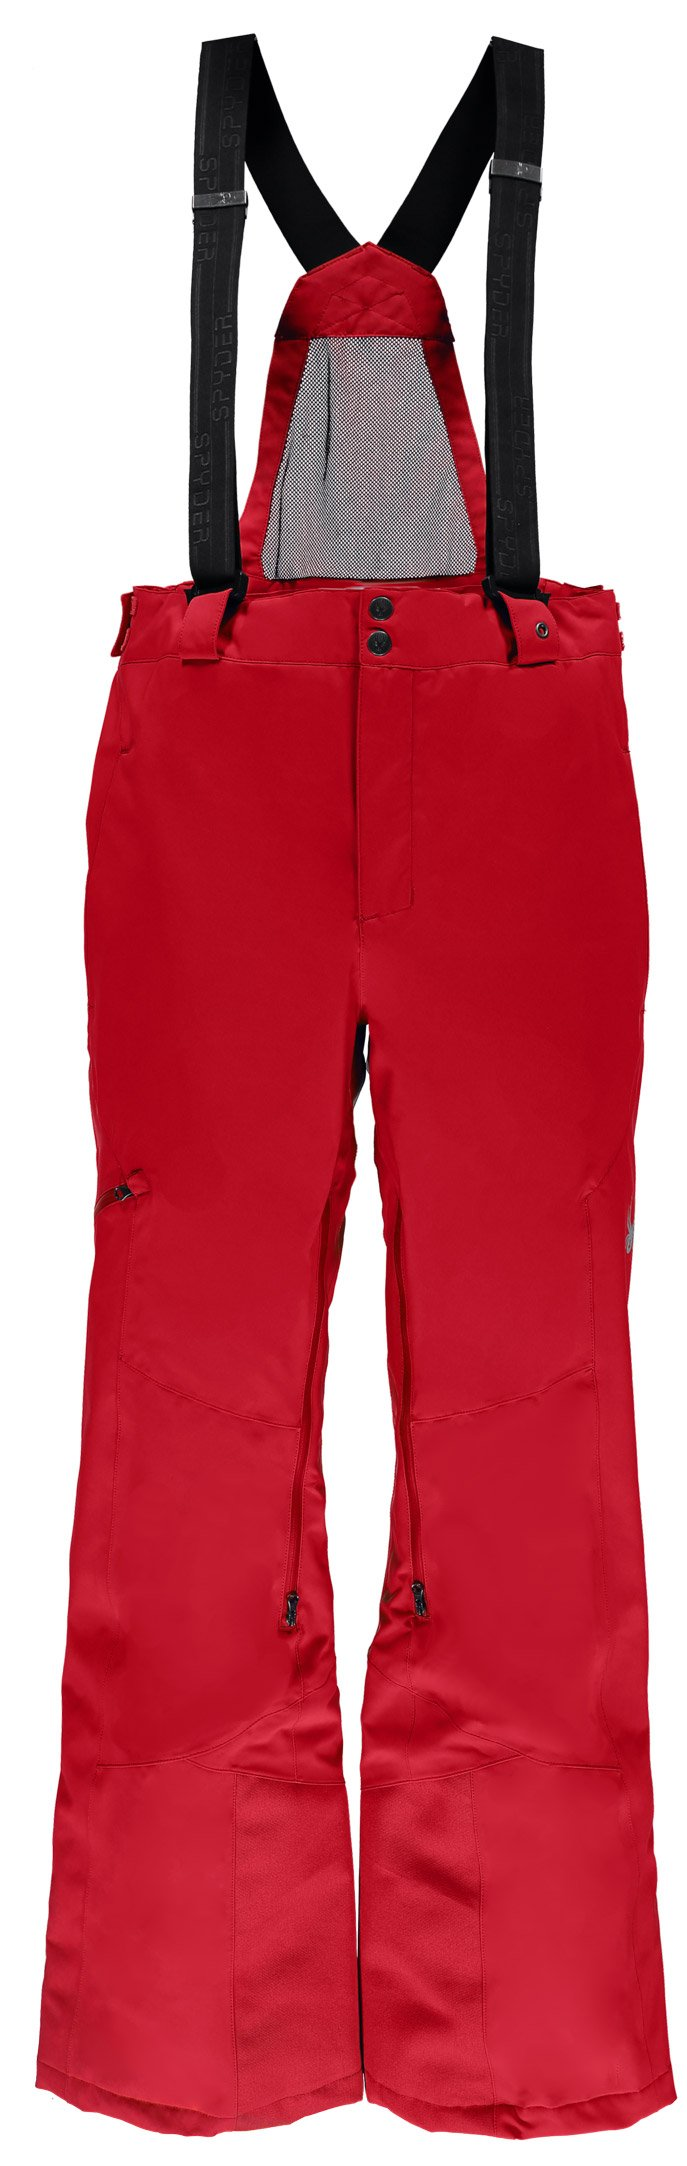 Spyder boys Leader 783367-PANT-600_2XL - Red by Spyder